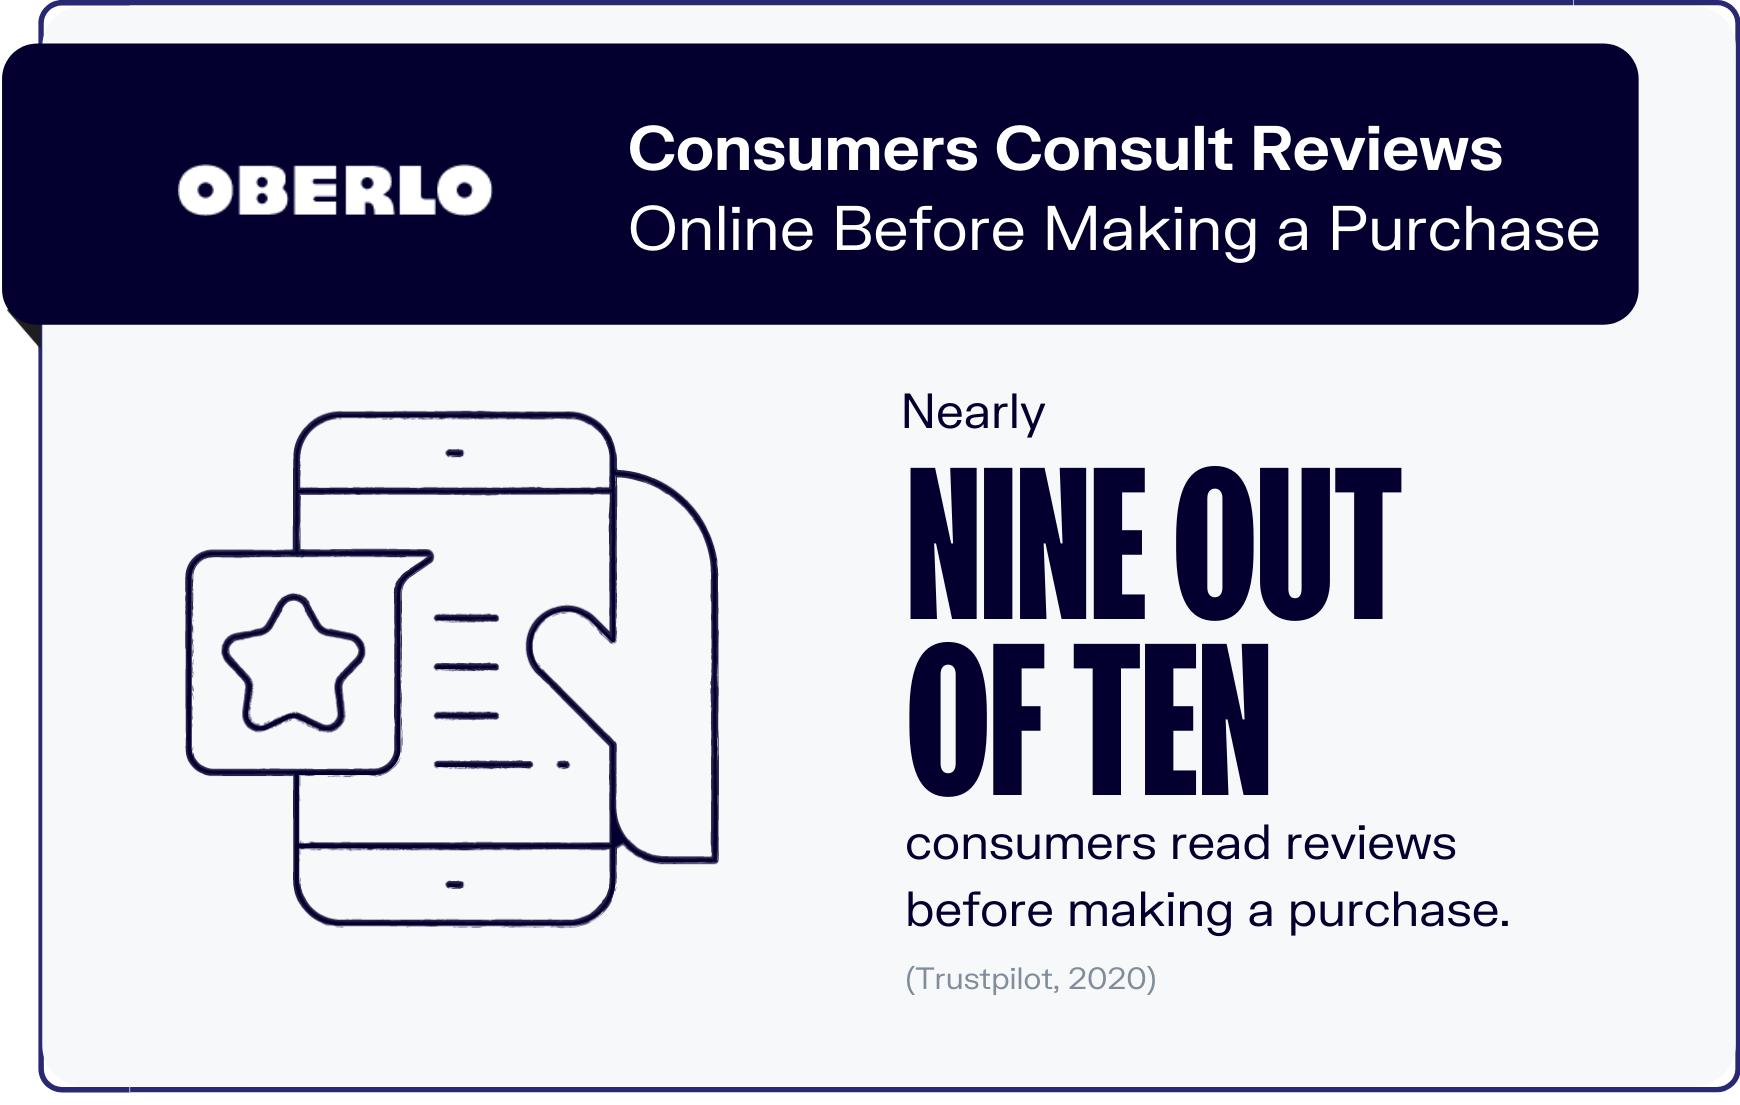 online reviews statistics graphic 1